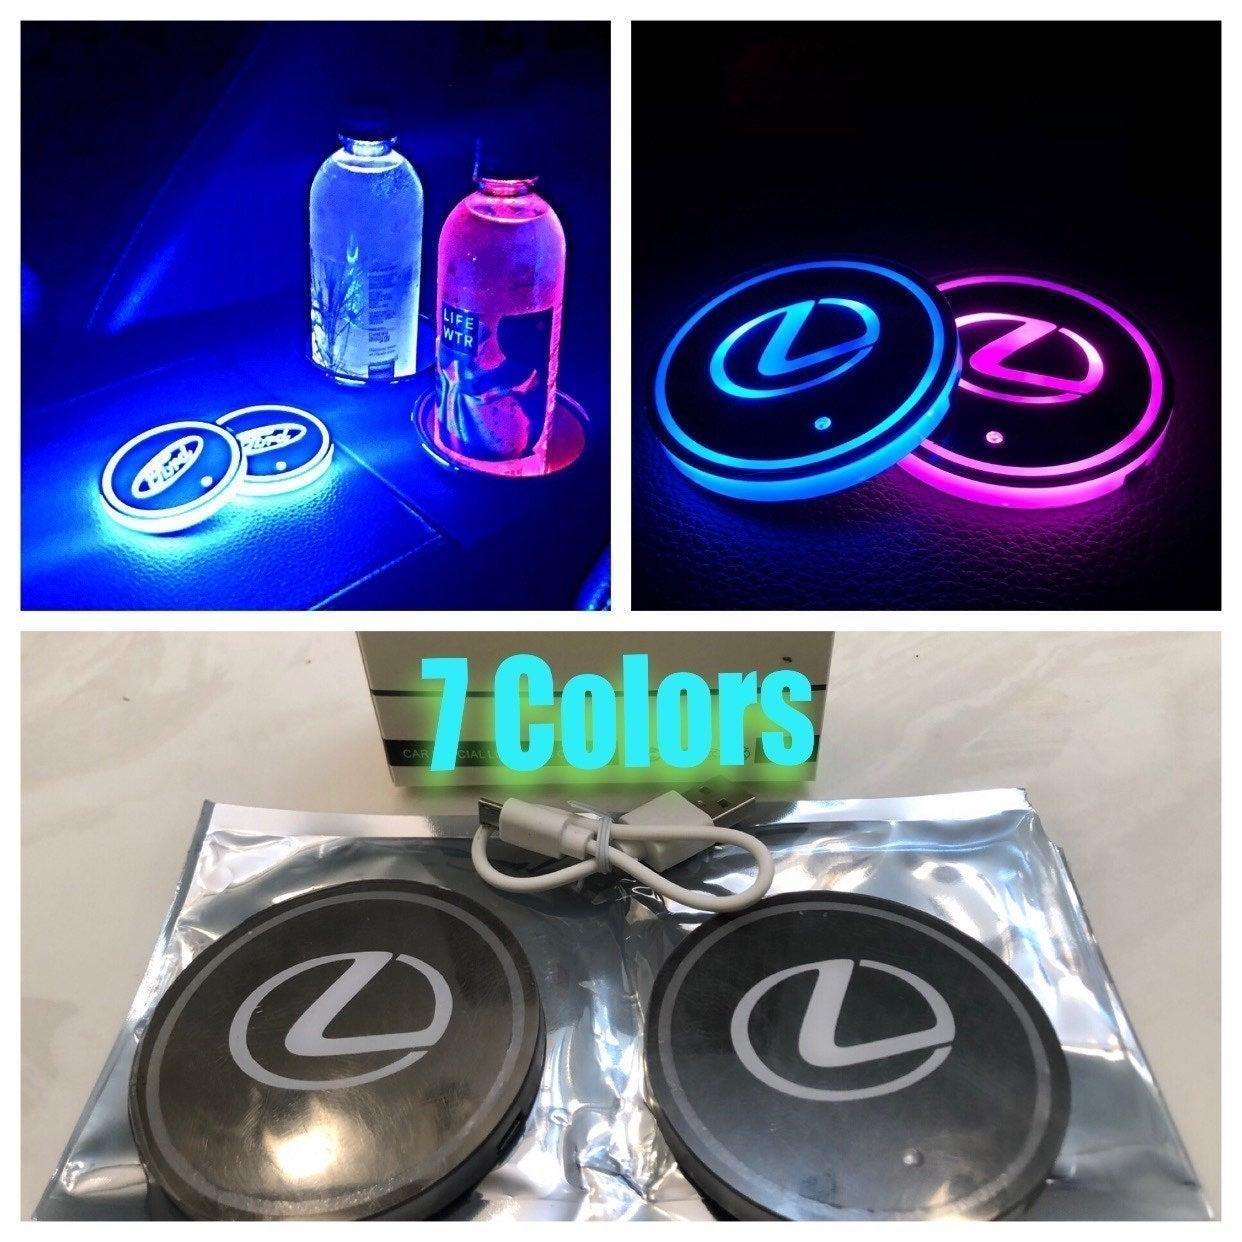 2 pc LED cup holder lights fits Lexus